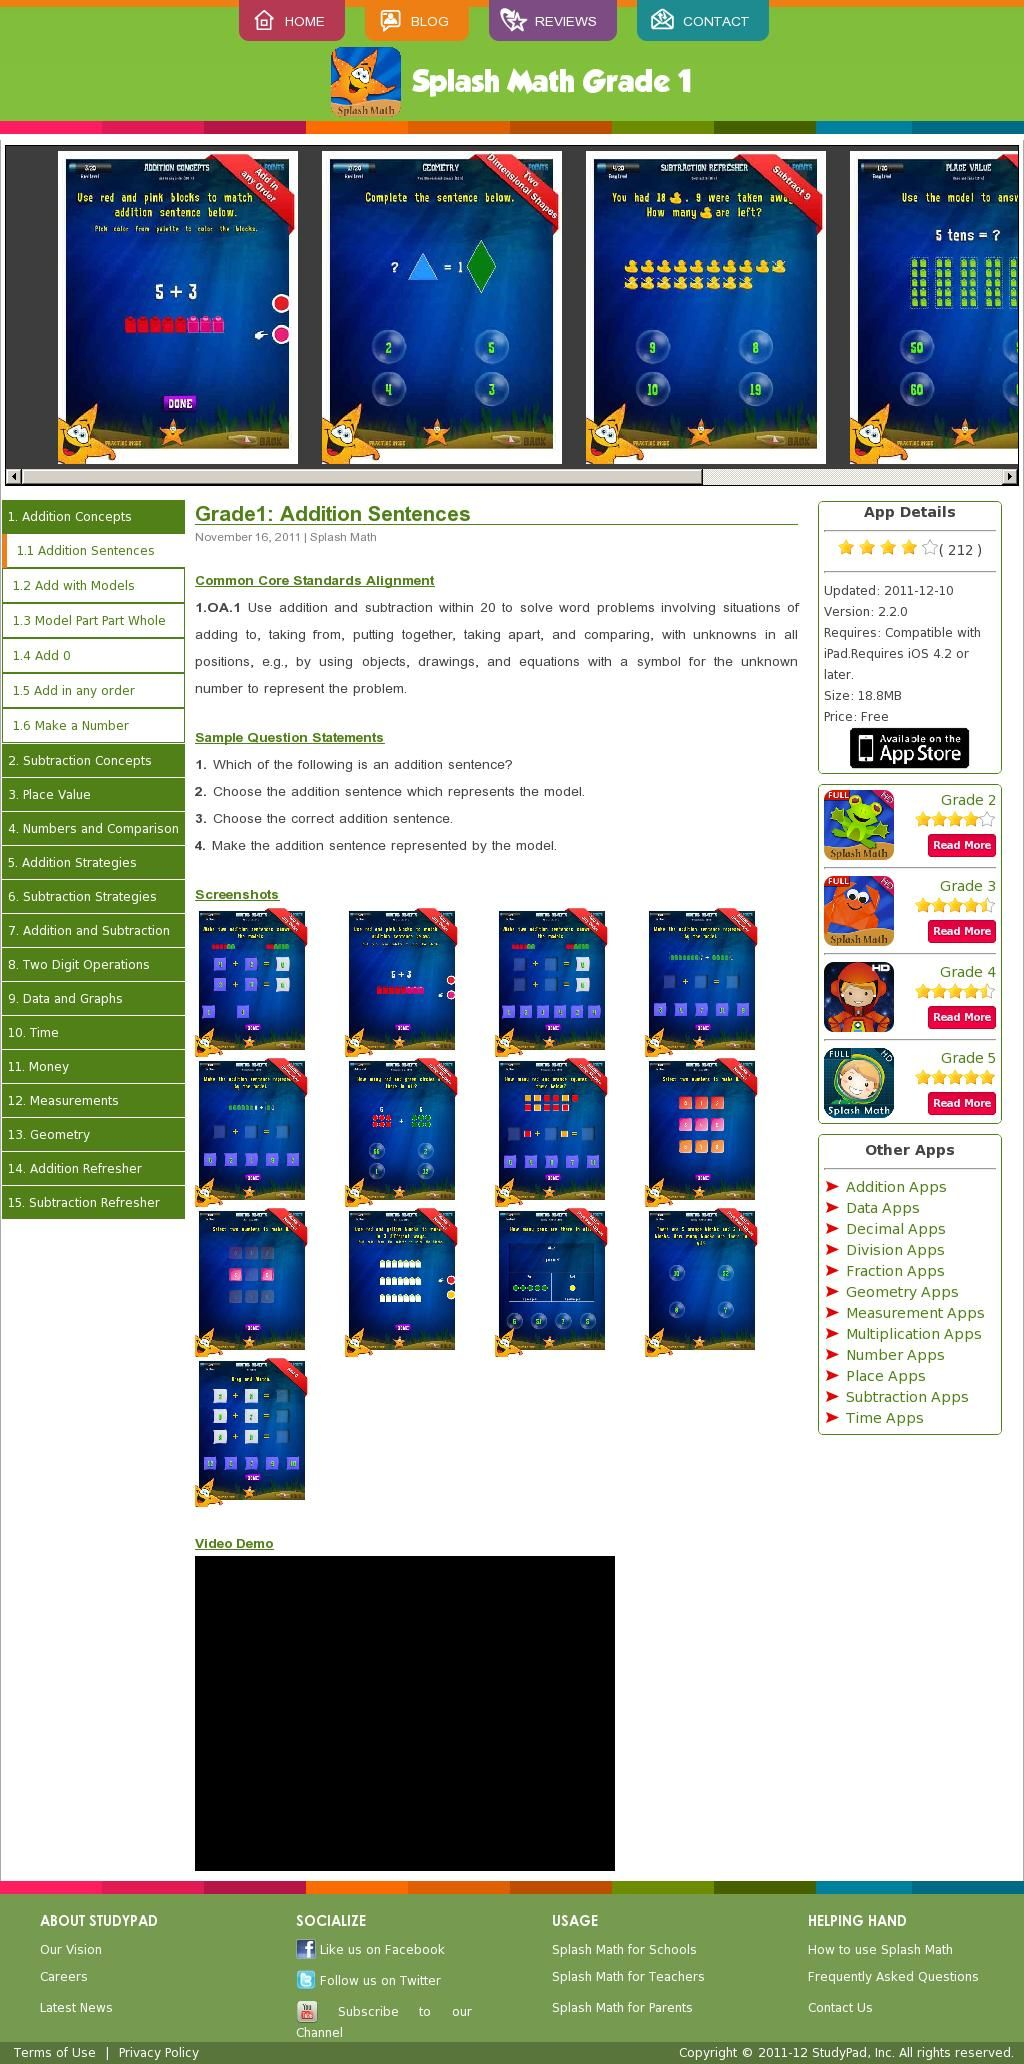 First Grade Splash Math App From Studypad The Developers Of Splash Math App For Grade First Grade Math Worksheets Math Practice Games Practice Math Problems [ 2064 x 1024 Pixel ]